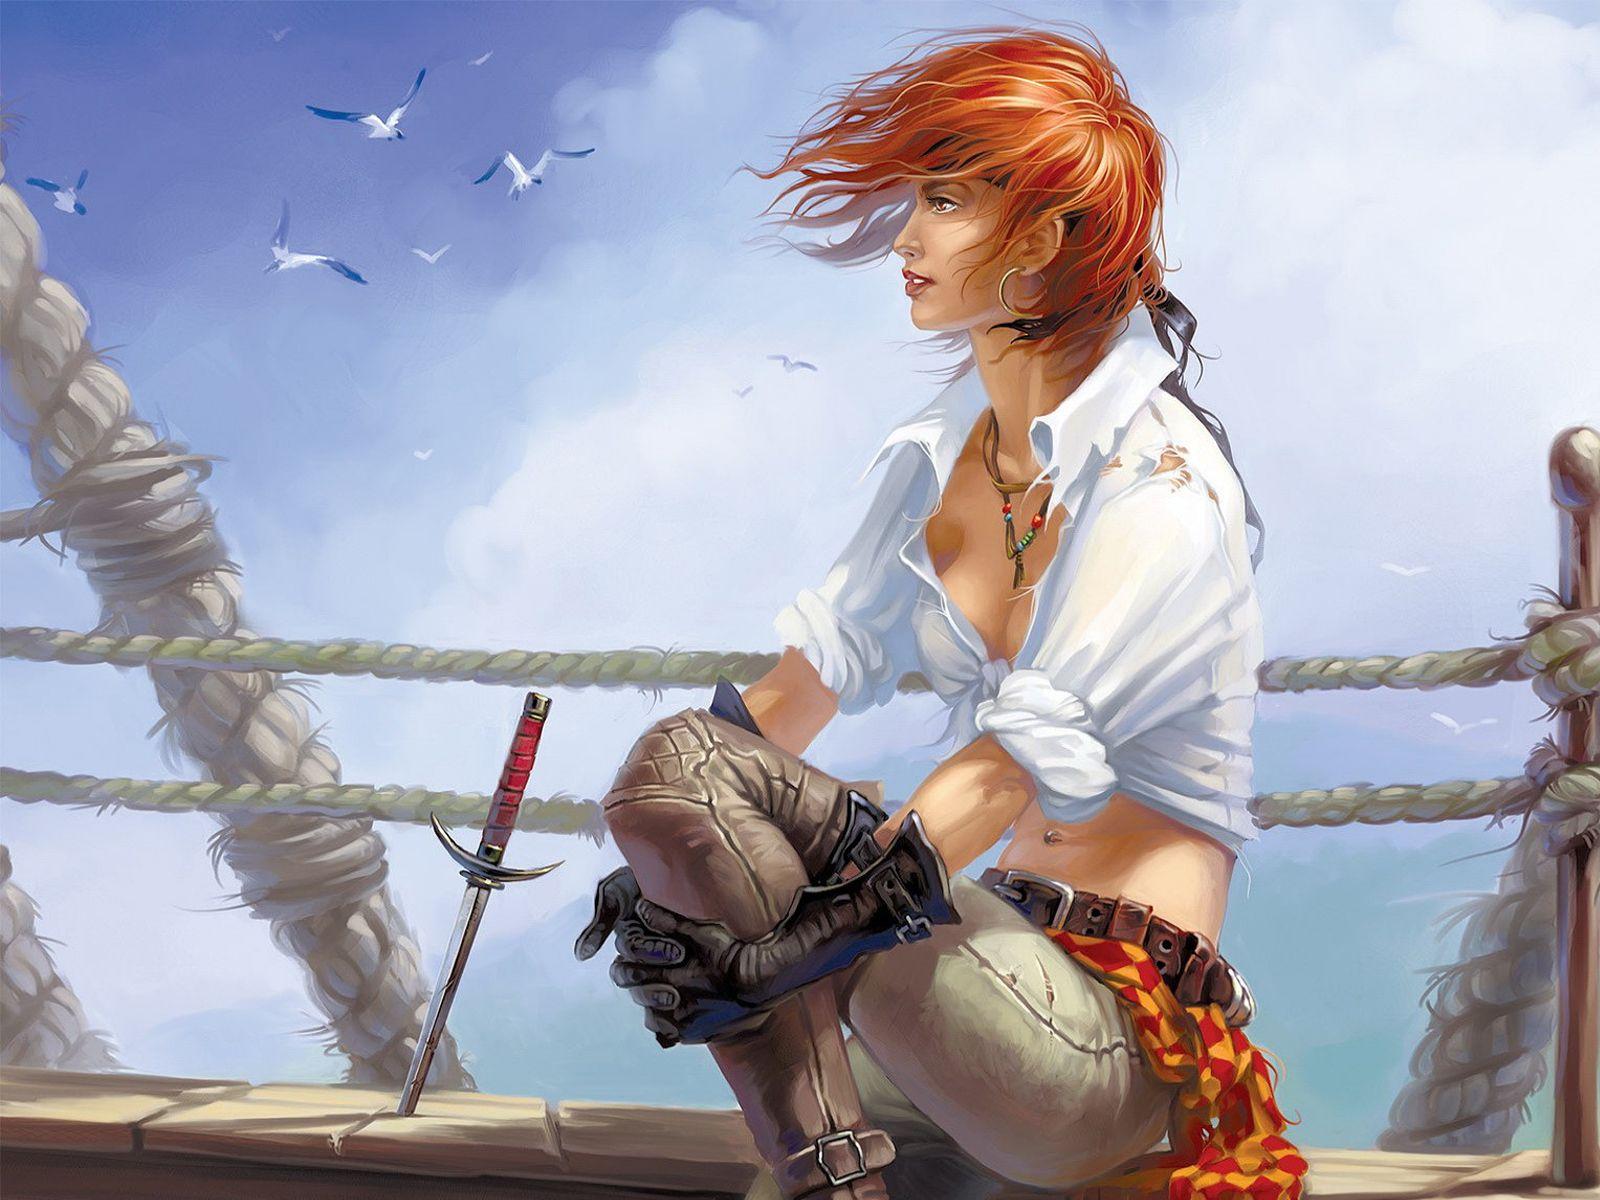 Free wallpaper of pirate woman firing guns pirate draw - Anime pirate wallpaper ...